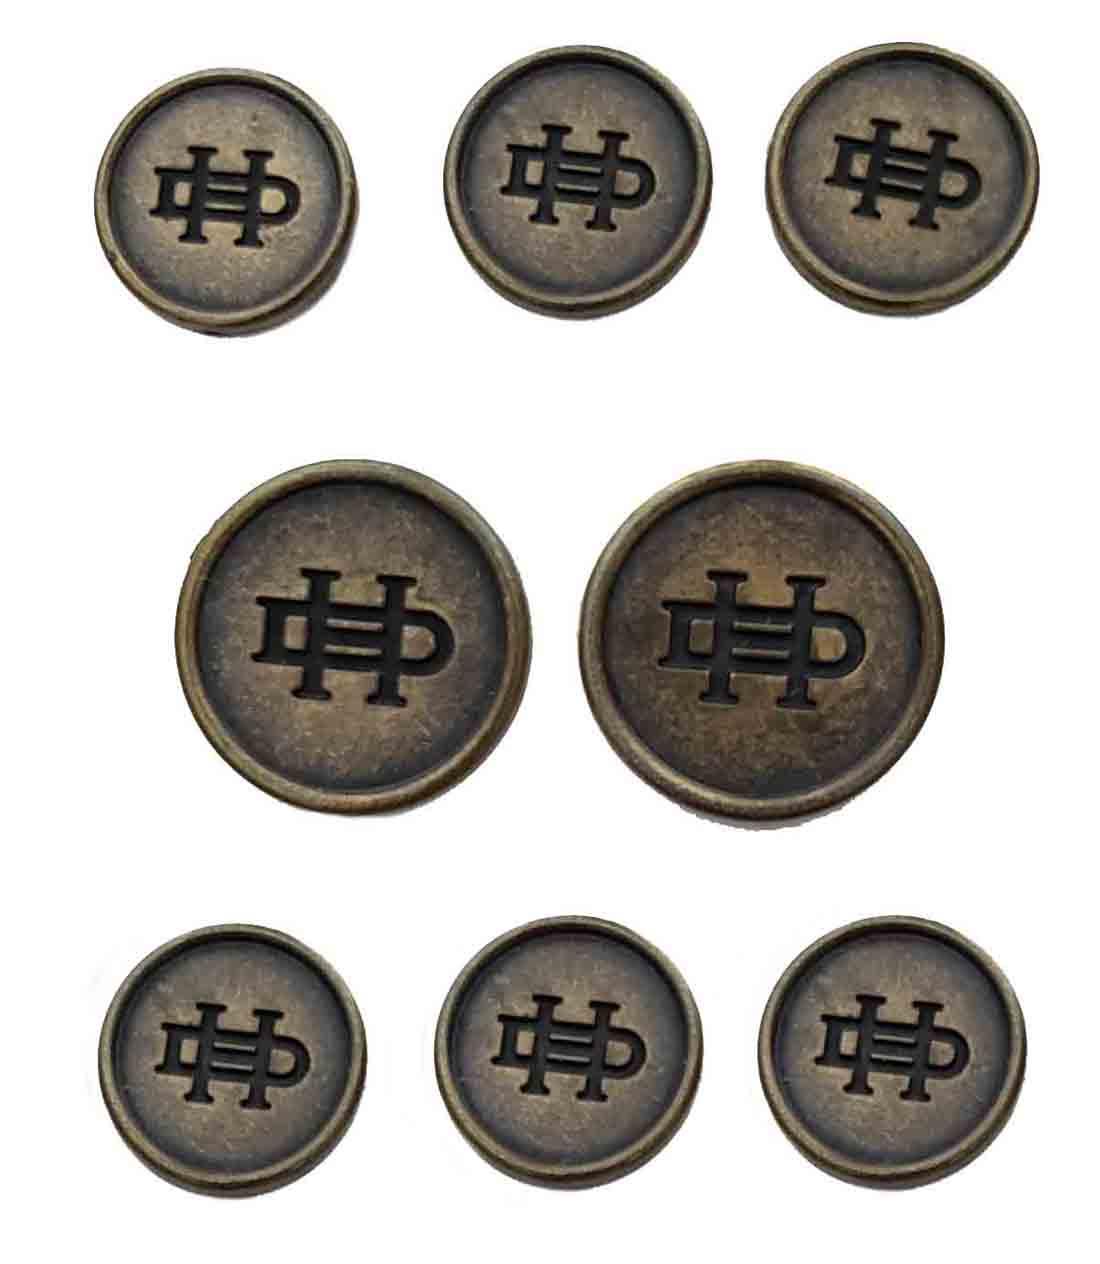 Vintage Daniel Hechter Blazer Buttons Set Brown Gold DH Monogram Men's